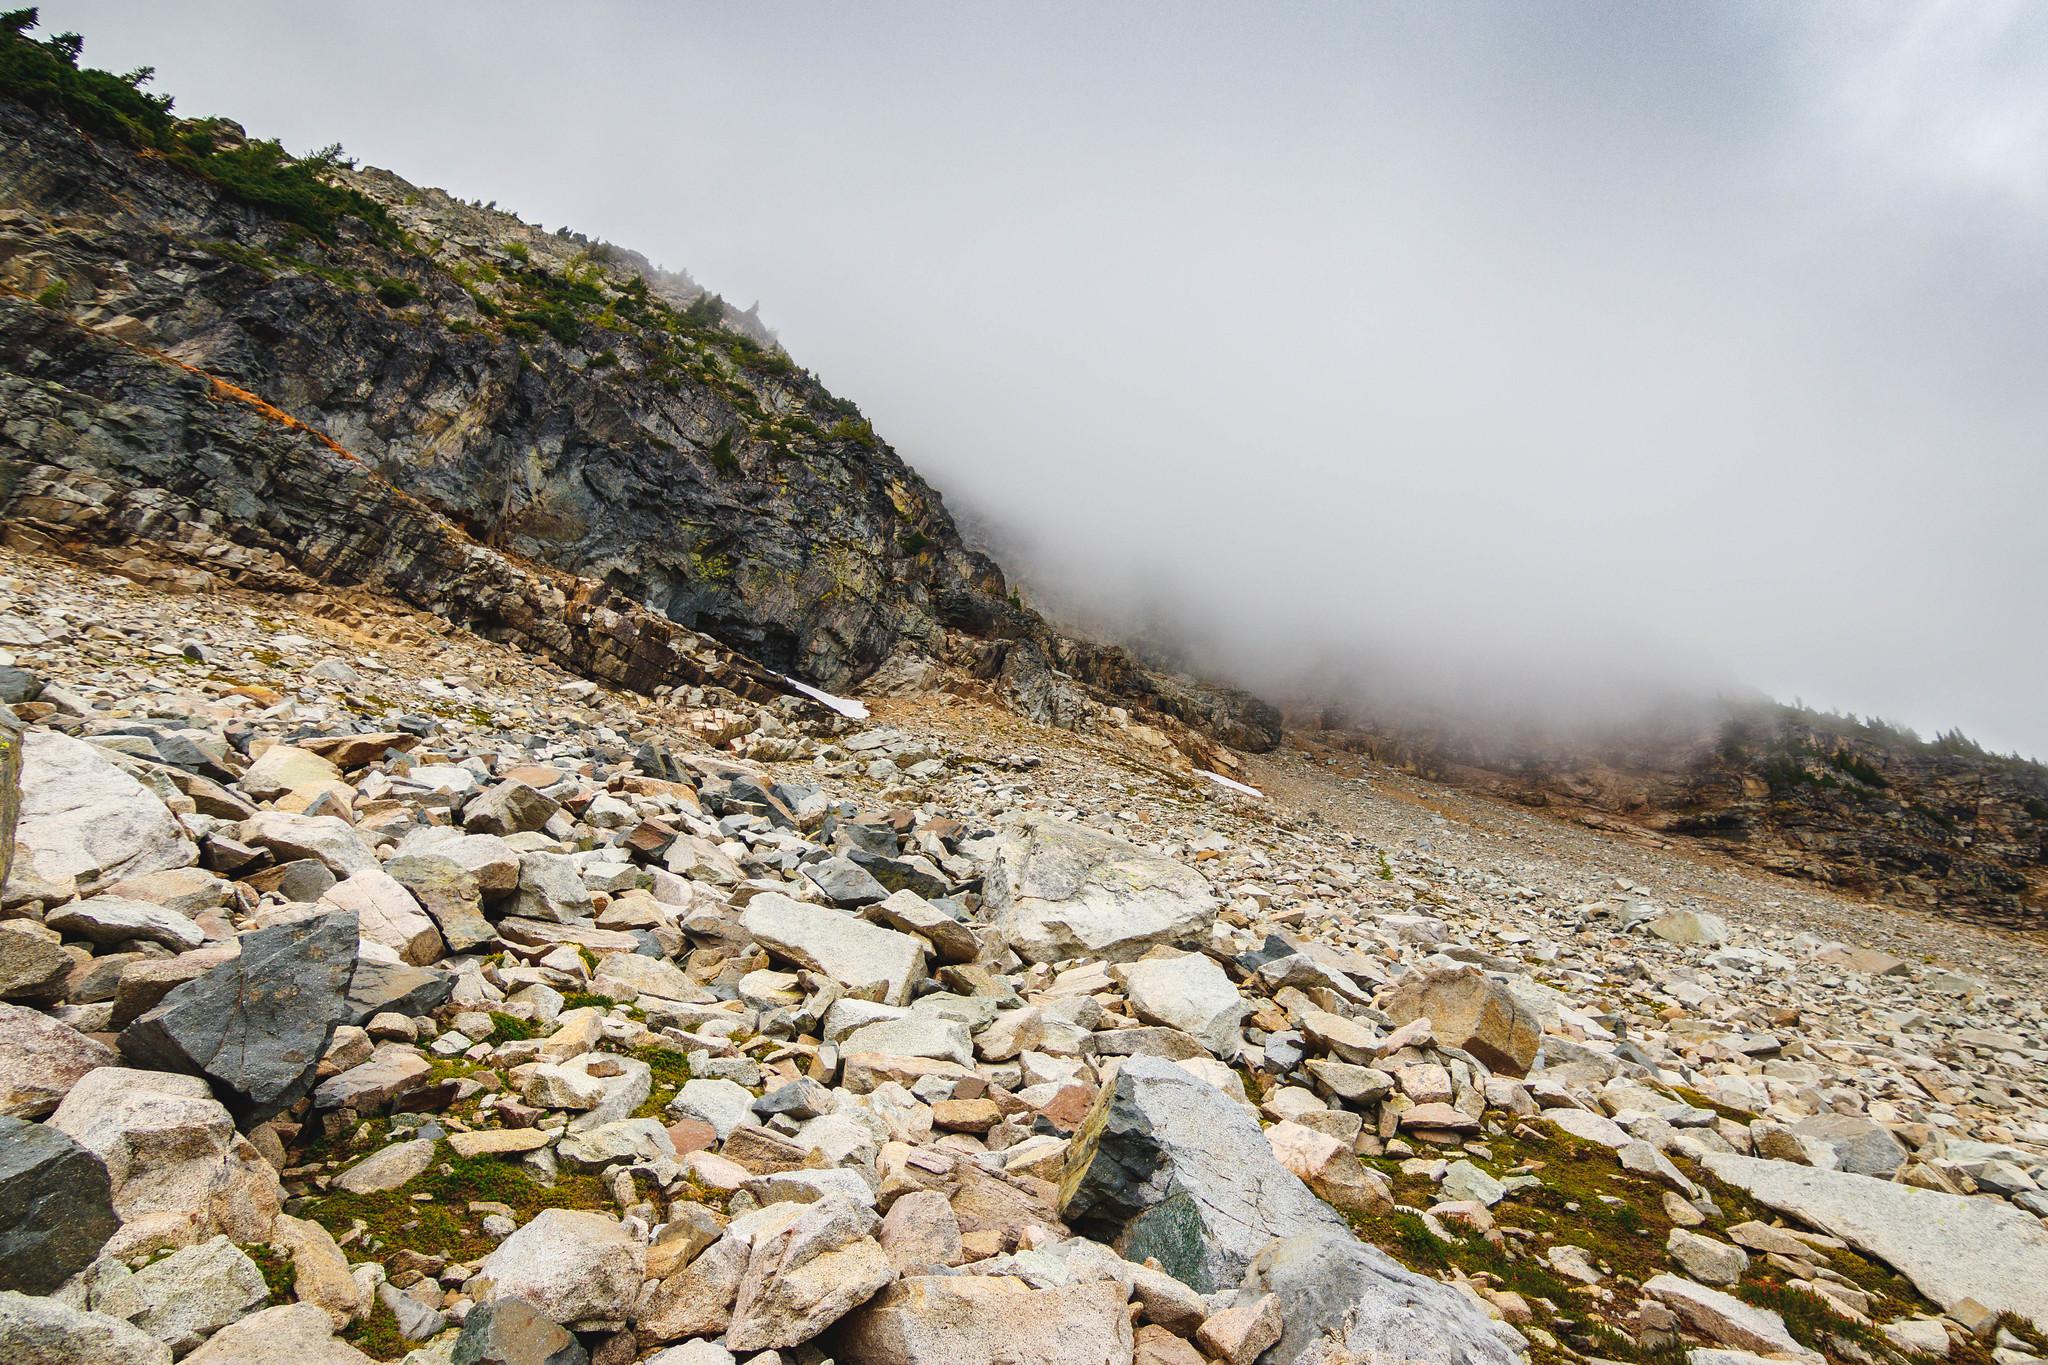 Corteo Peak east basin